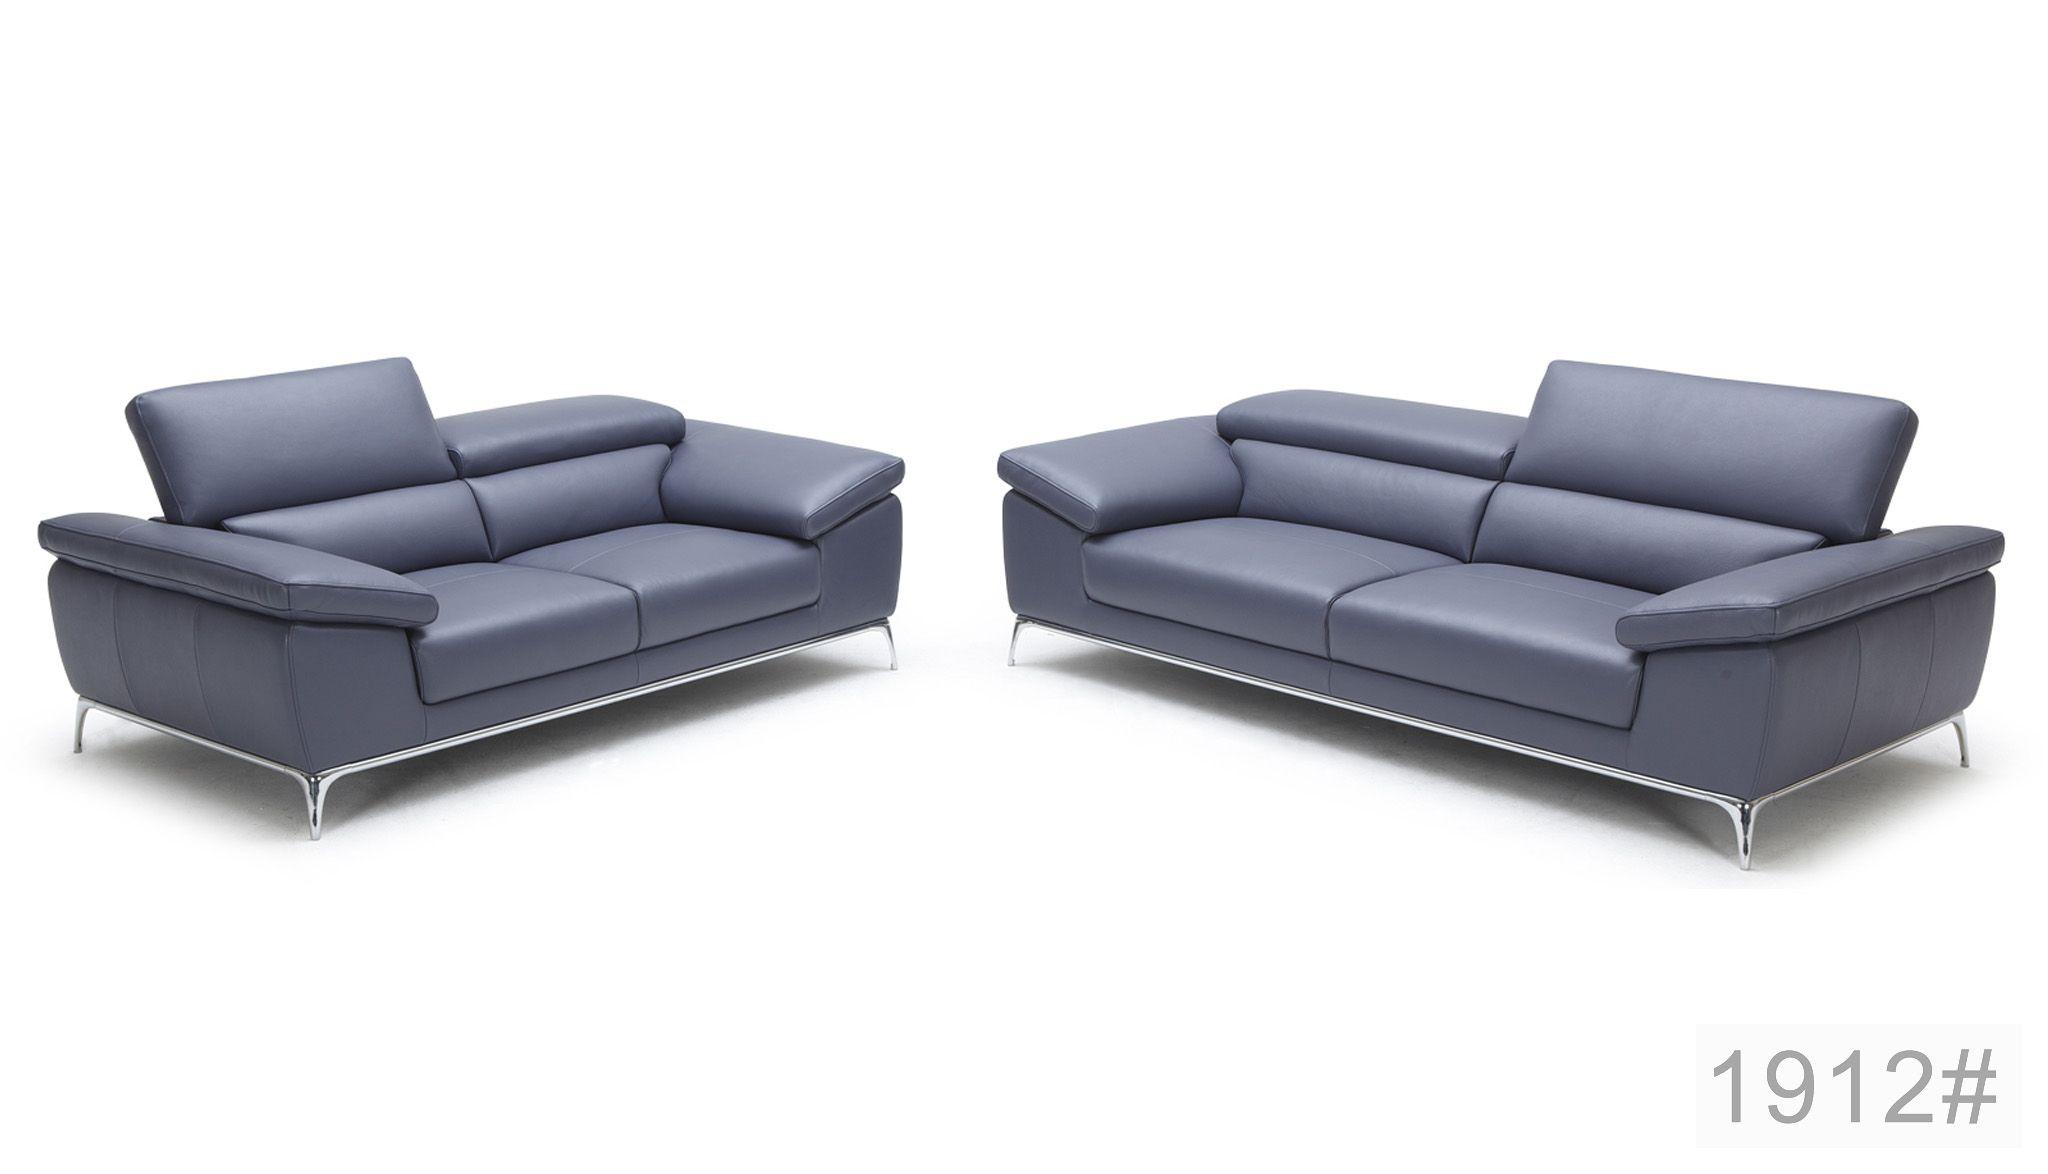 Italian Leather Sofa With Headrest Adjustable Leather Sofa Set Sofa Leather Sofa